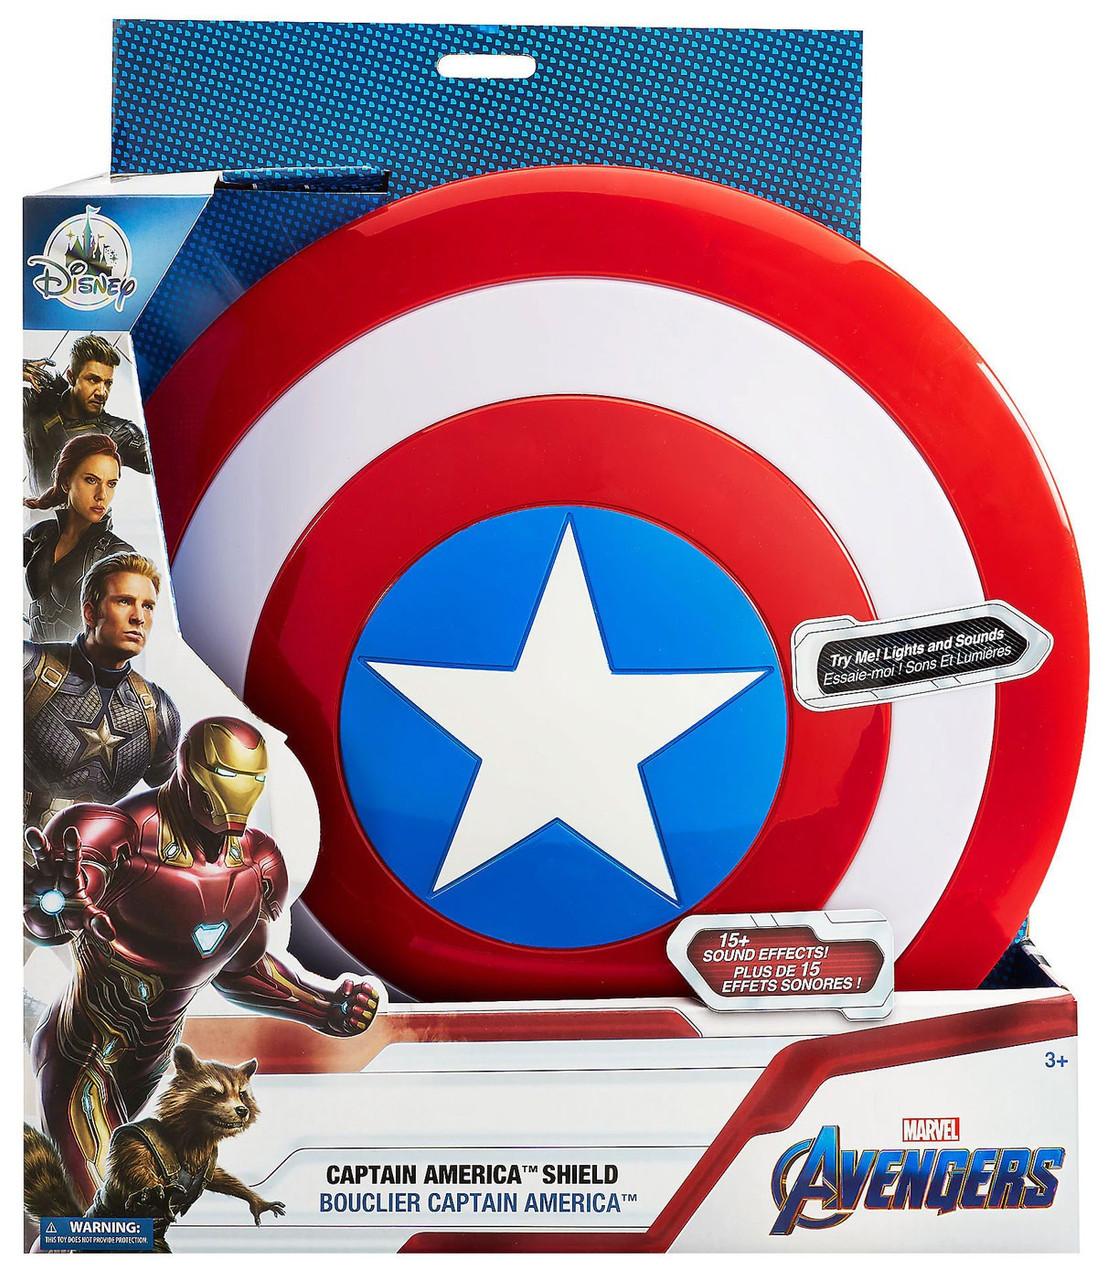 disney marvel avengers captain america shield exclusive roleplay toy toywiz disney marvel avengers captain america